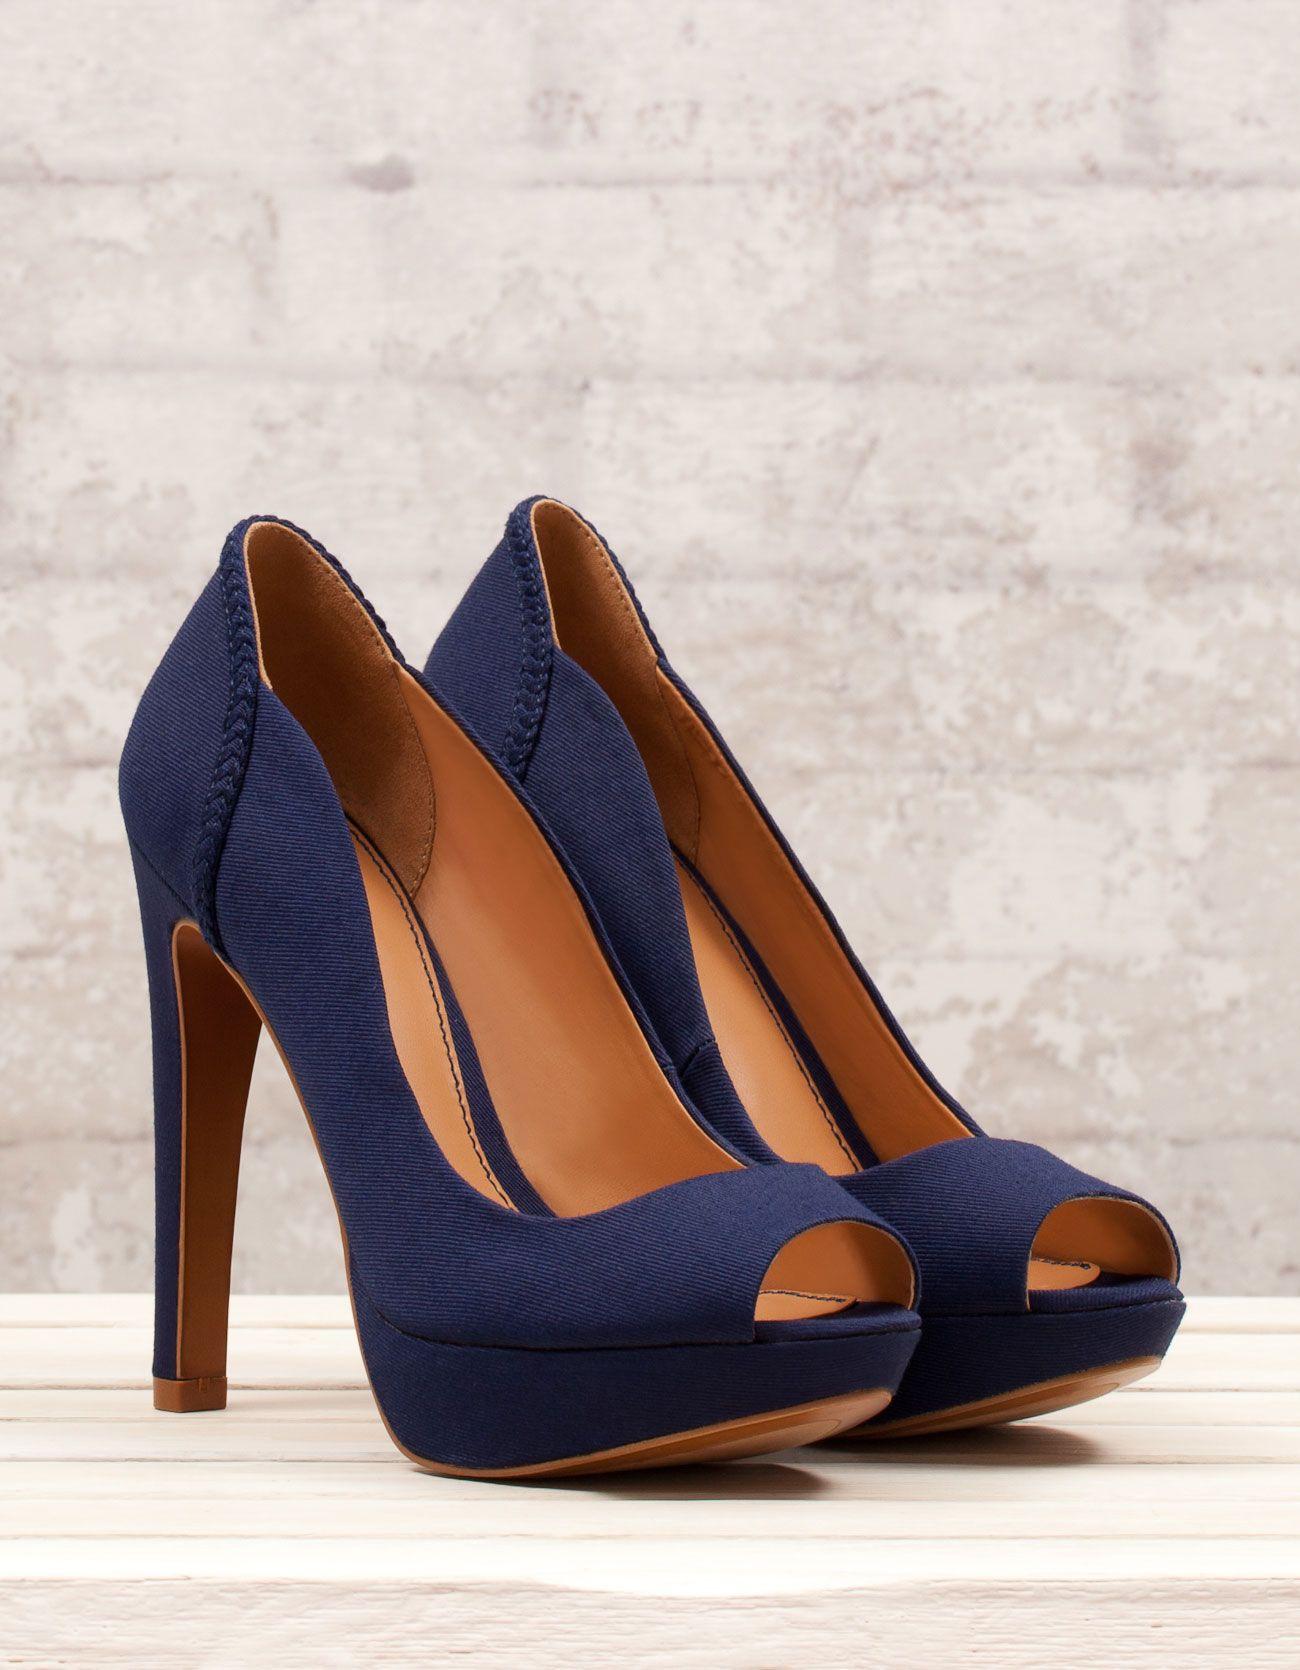 Basic platform shoes | Shoes I want!! | Pinterest | Schuhe, Ideen ...